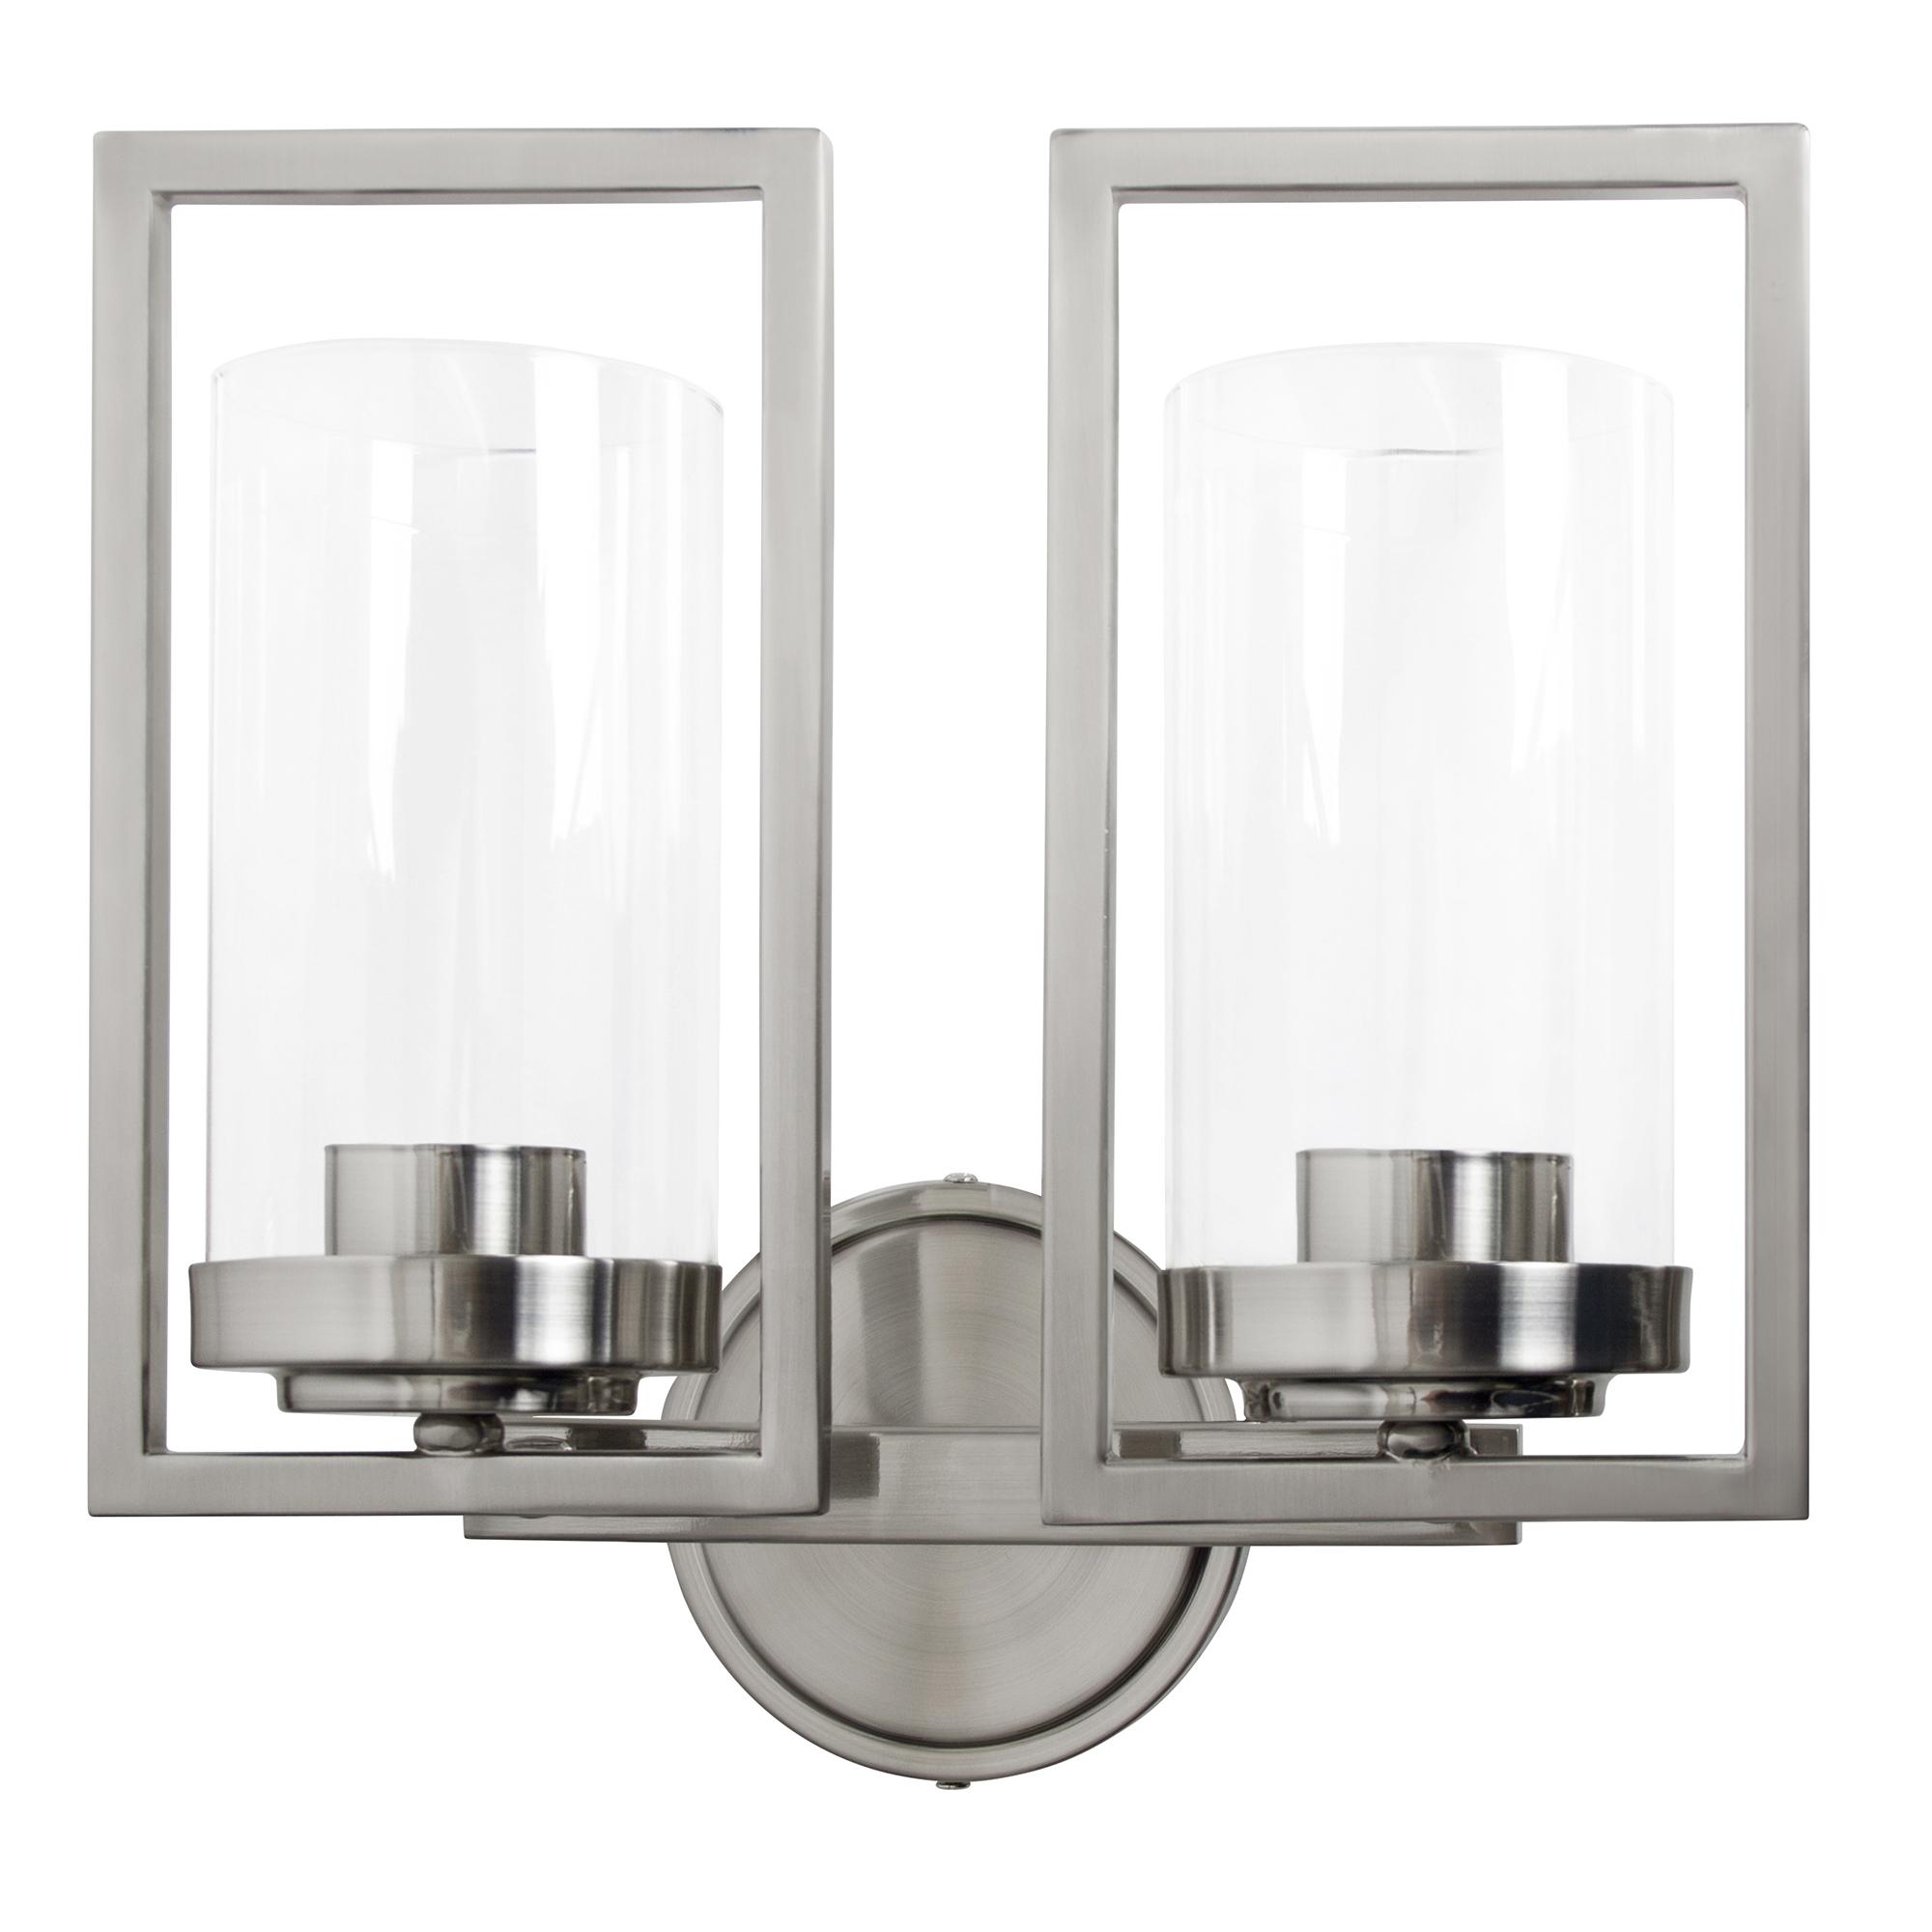 Sunset Lighting Prestige Two Light Wall Sconce - in Bright Satin Nickel, Glass, 2 Bulbs